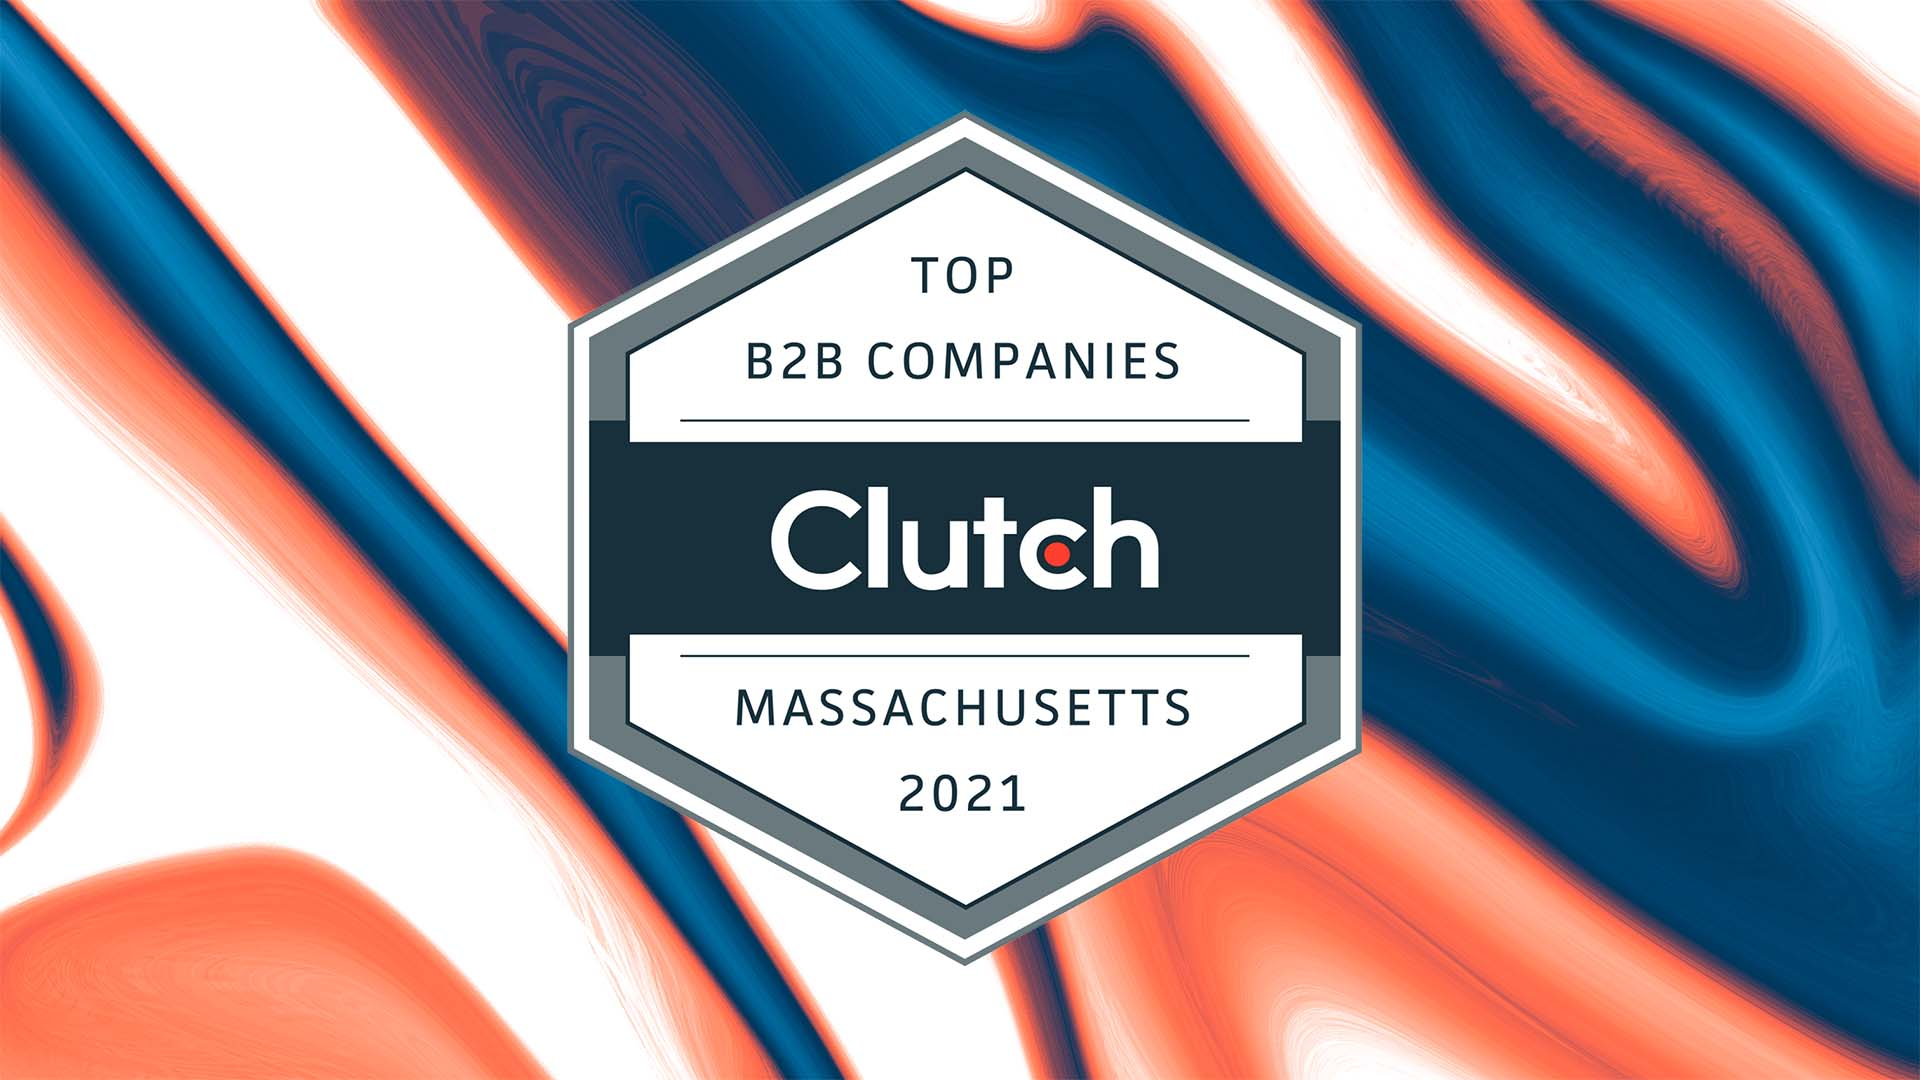 Clutch Recognizes Composite as a Top UX Design Company